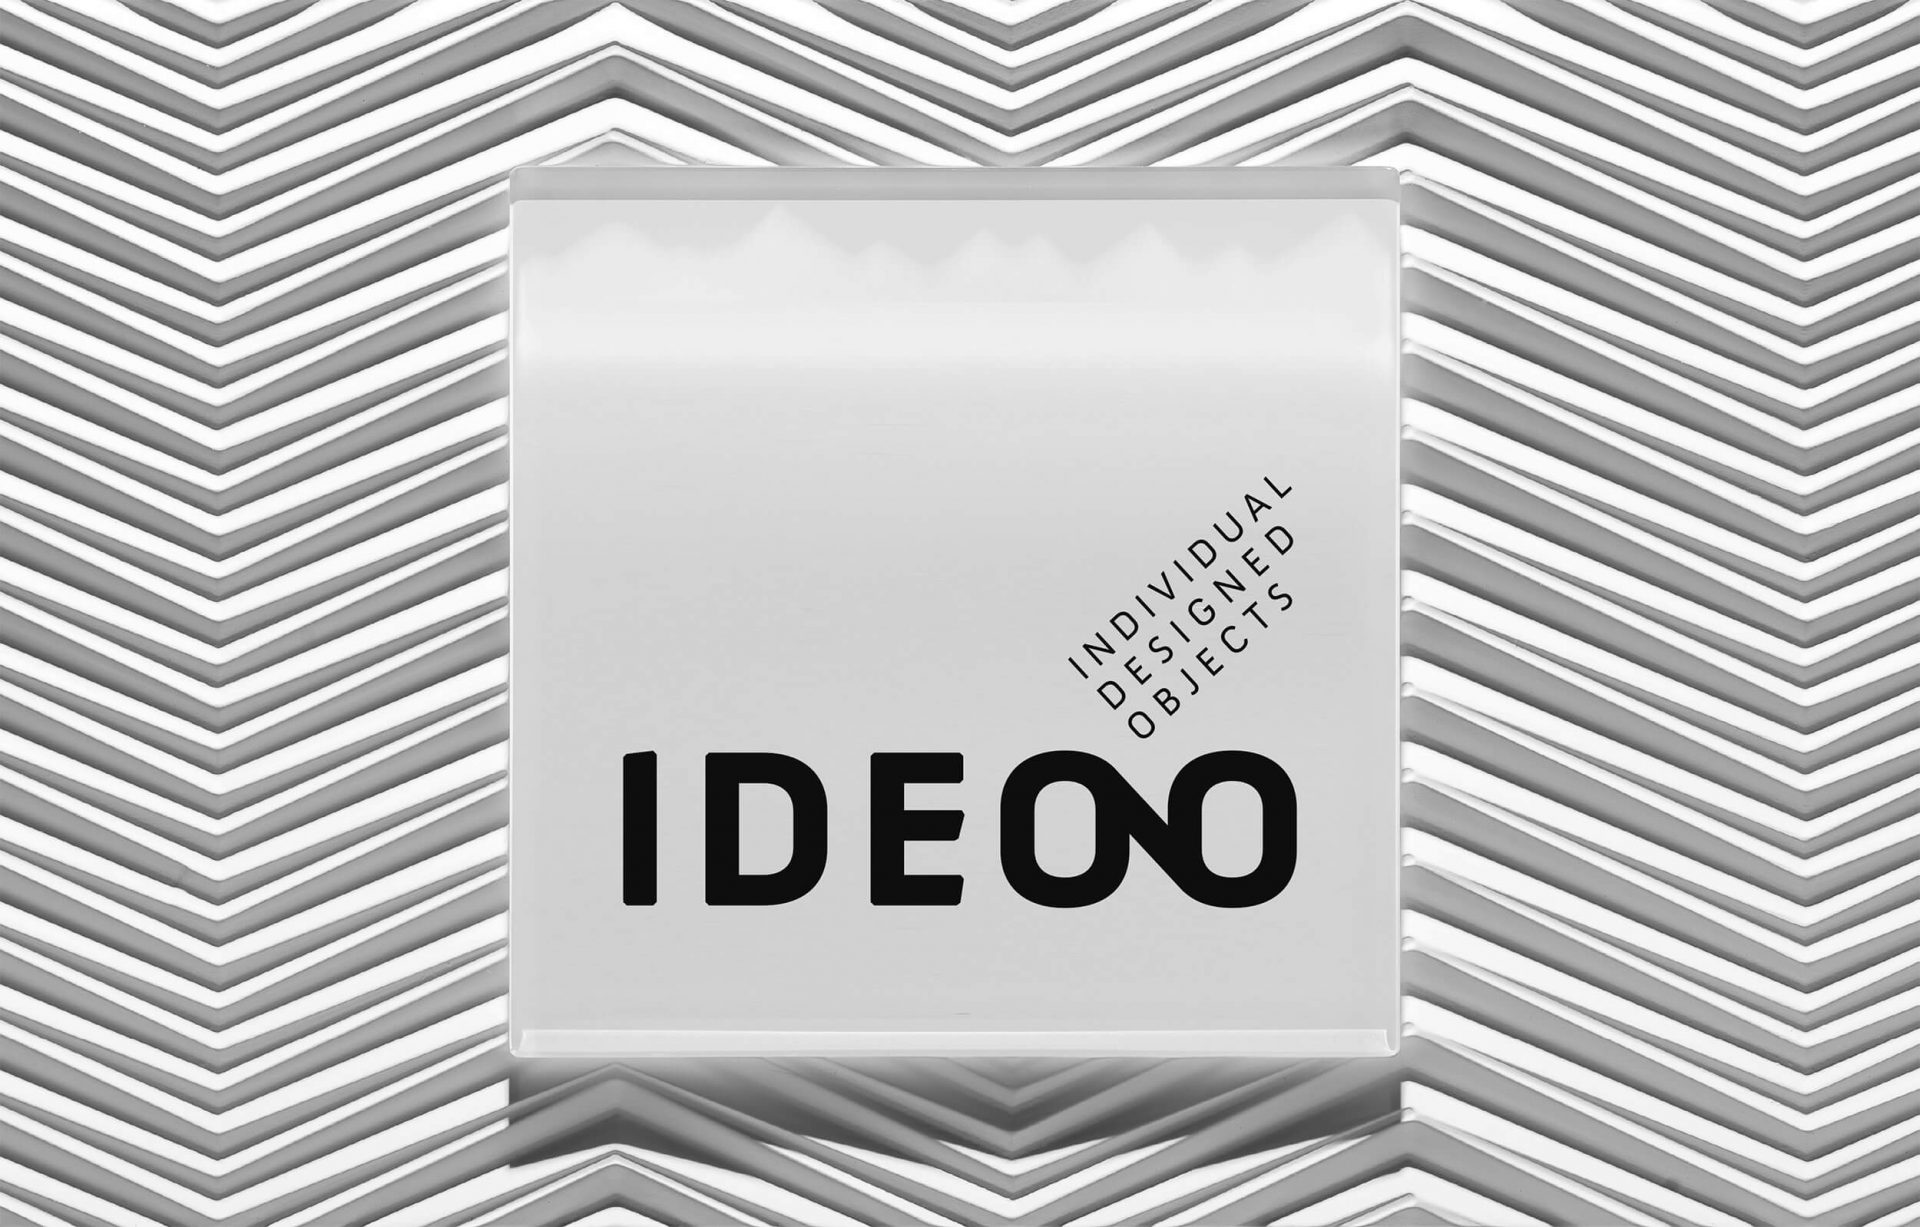 ideoo-white